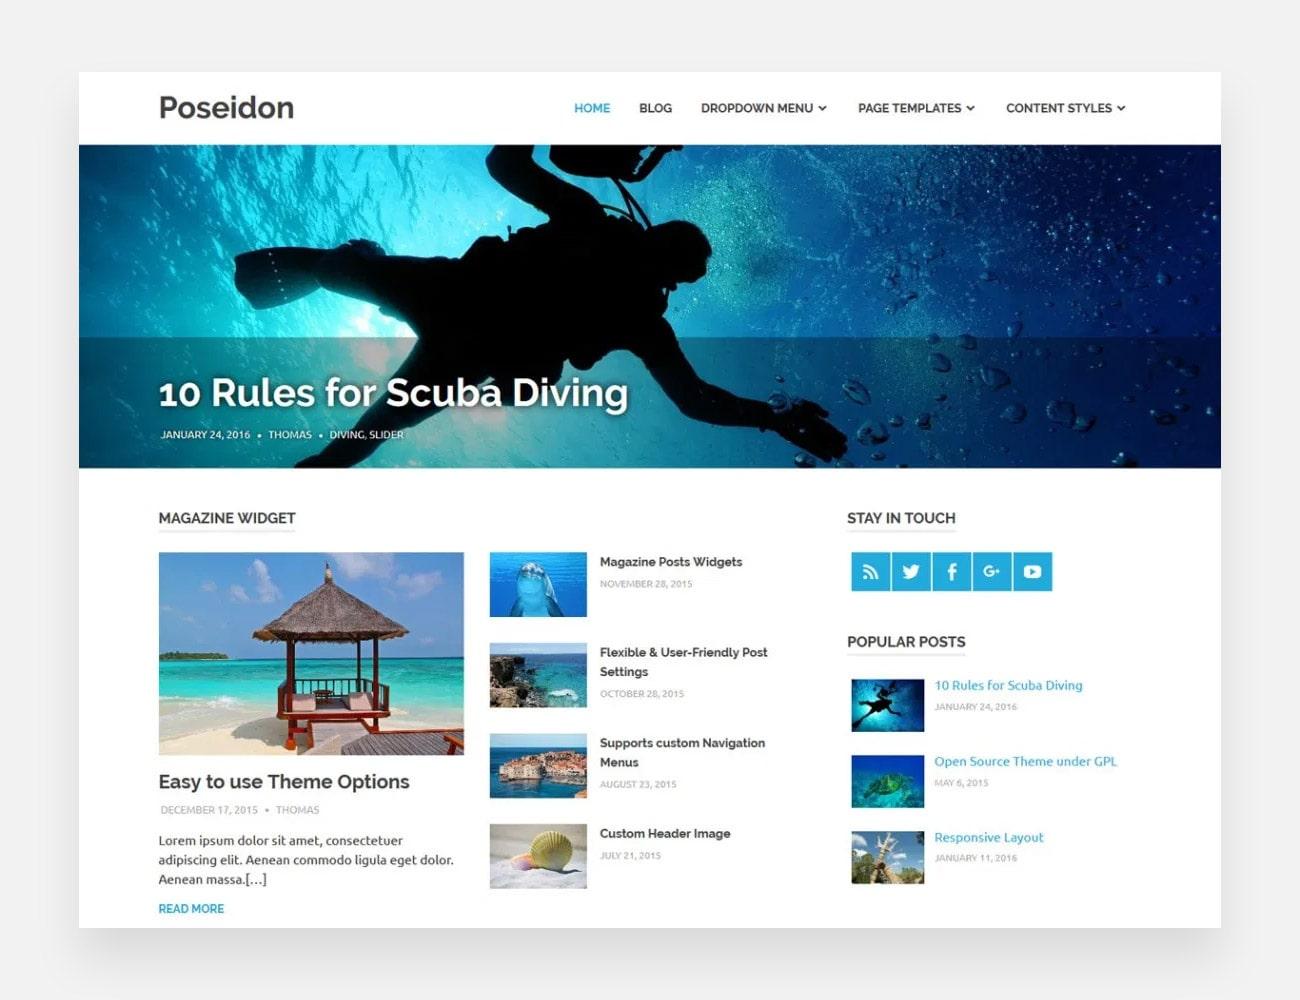 Poseidon Free WordPress Themes for Writers